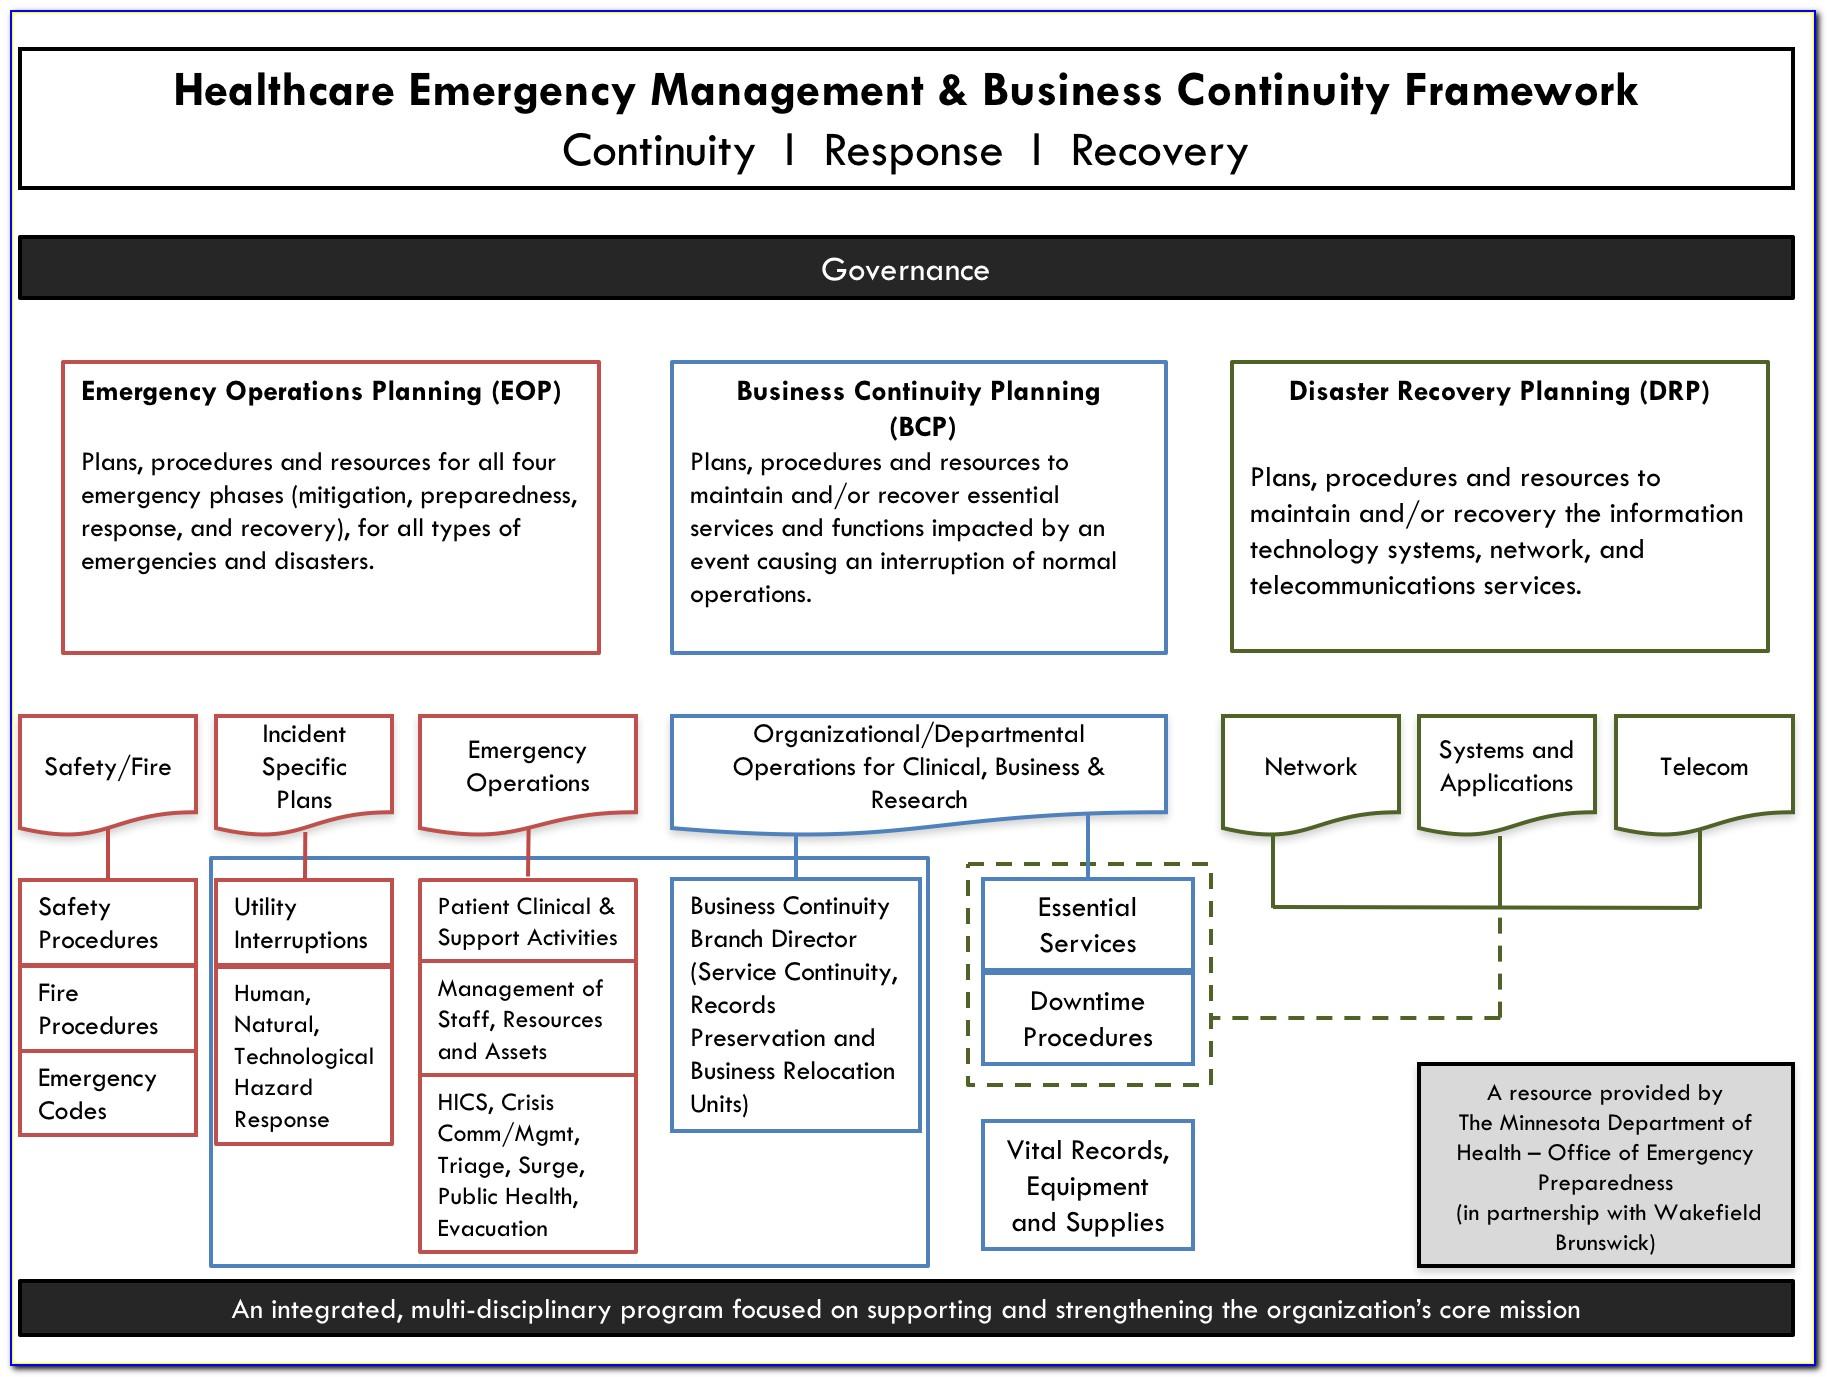 Sample Emergency Preparedness Plan For Home Health Agencies